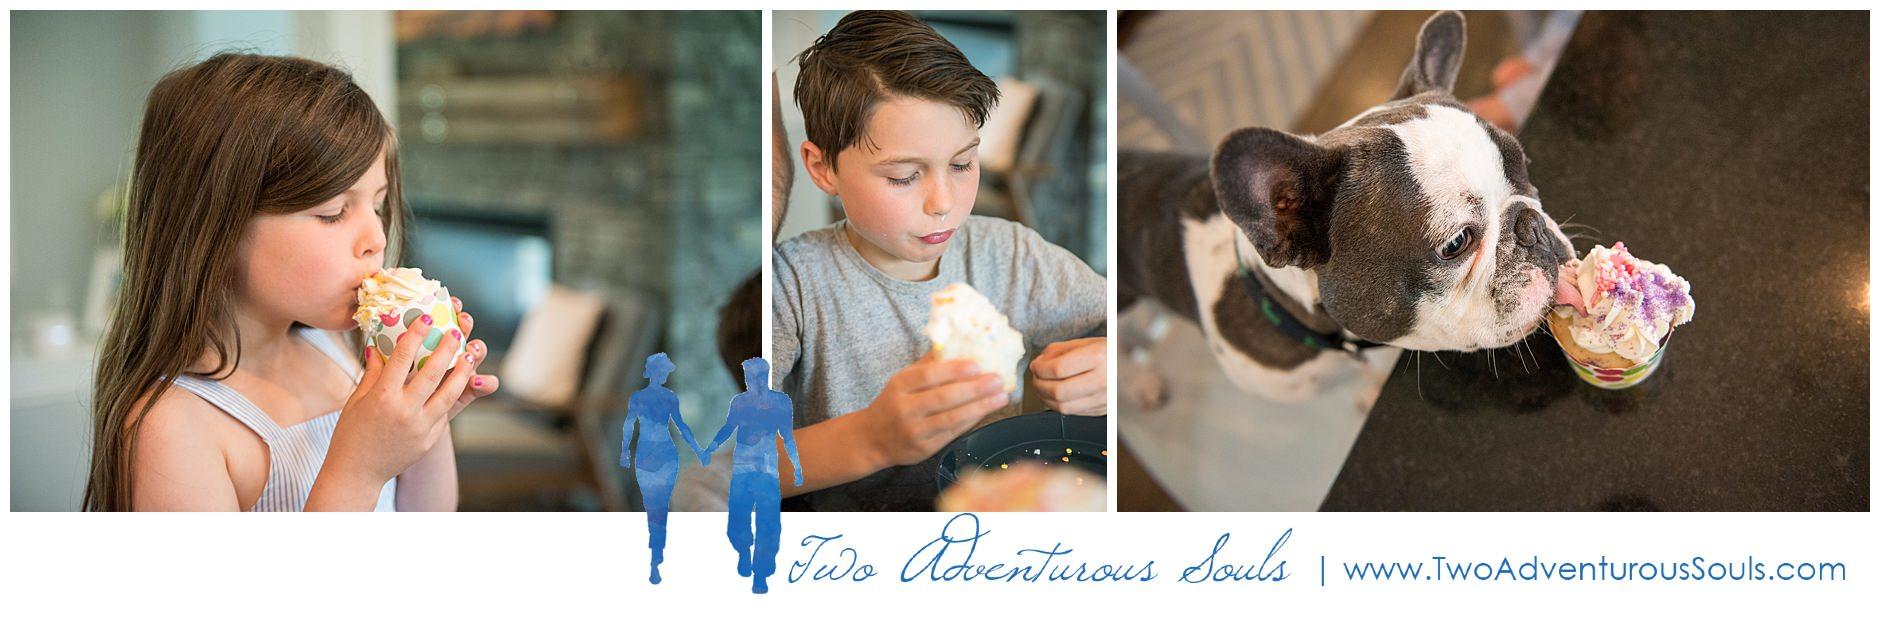 Family Photographers, Lifestyle Family Photographers, Maine Family Photographers, Two Adventurous Souls_0010.jpg